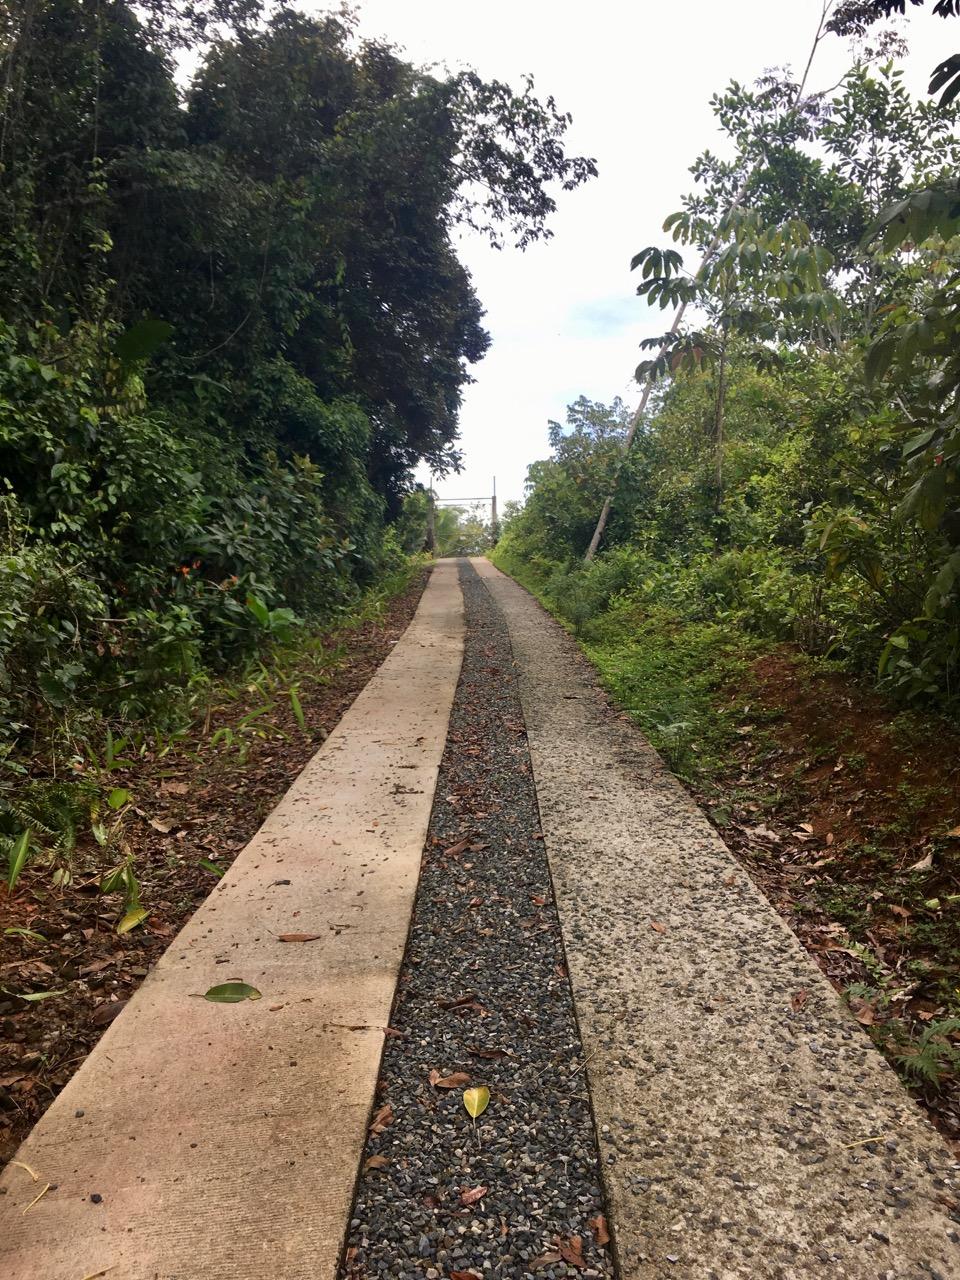 The driveway leading to PurUvita.